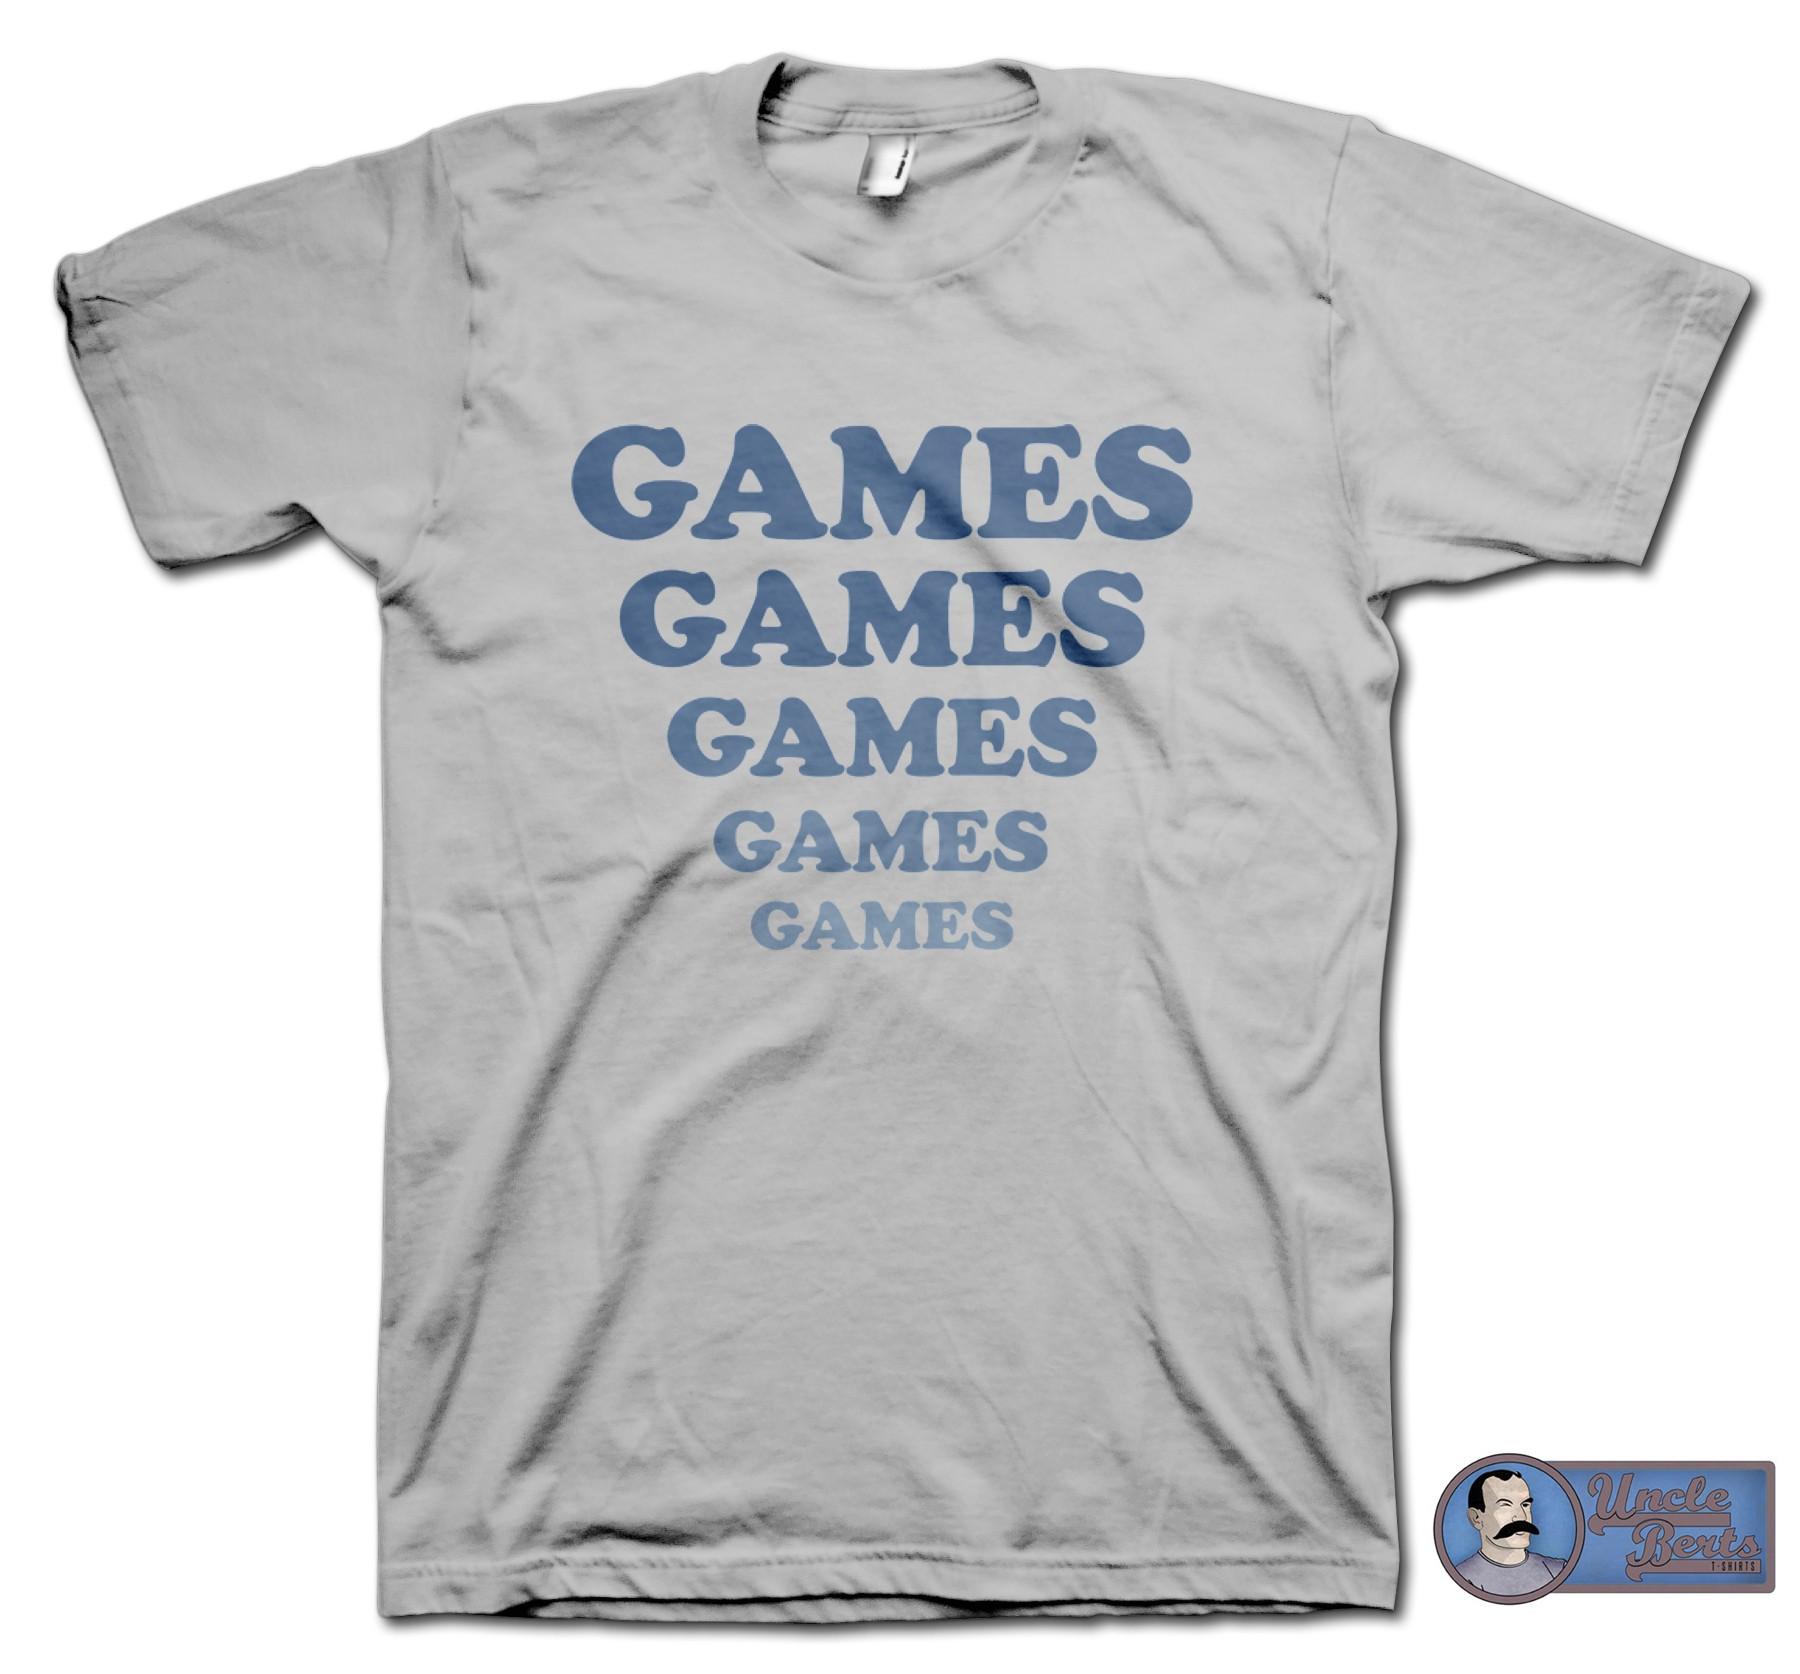 Adventureland (2009) inspired Games Games Games T-Shirt